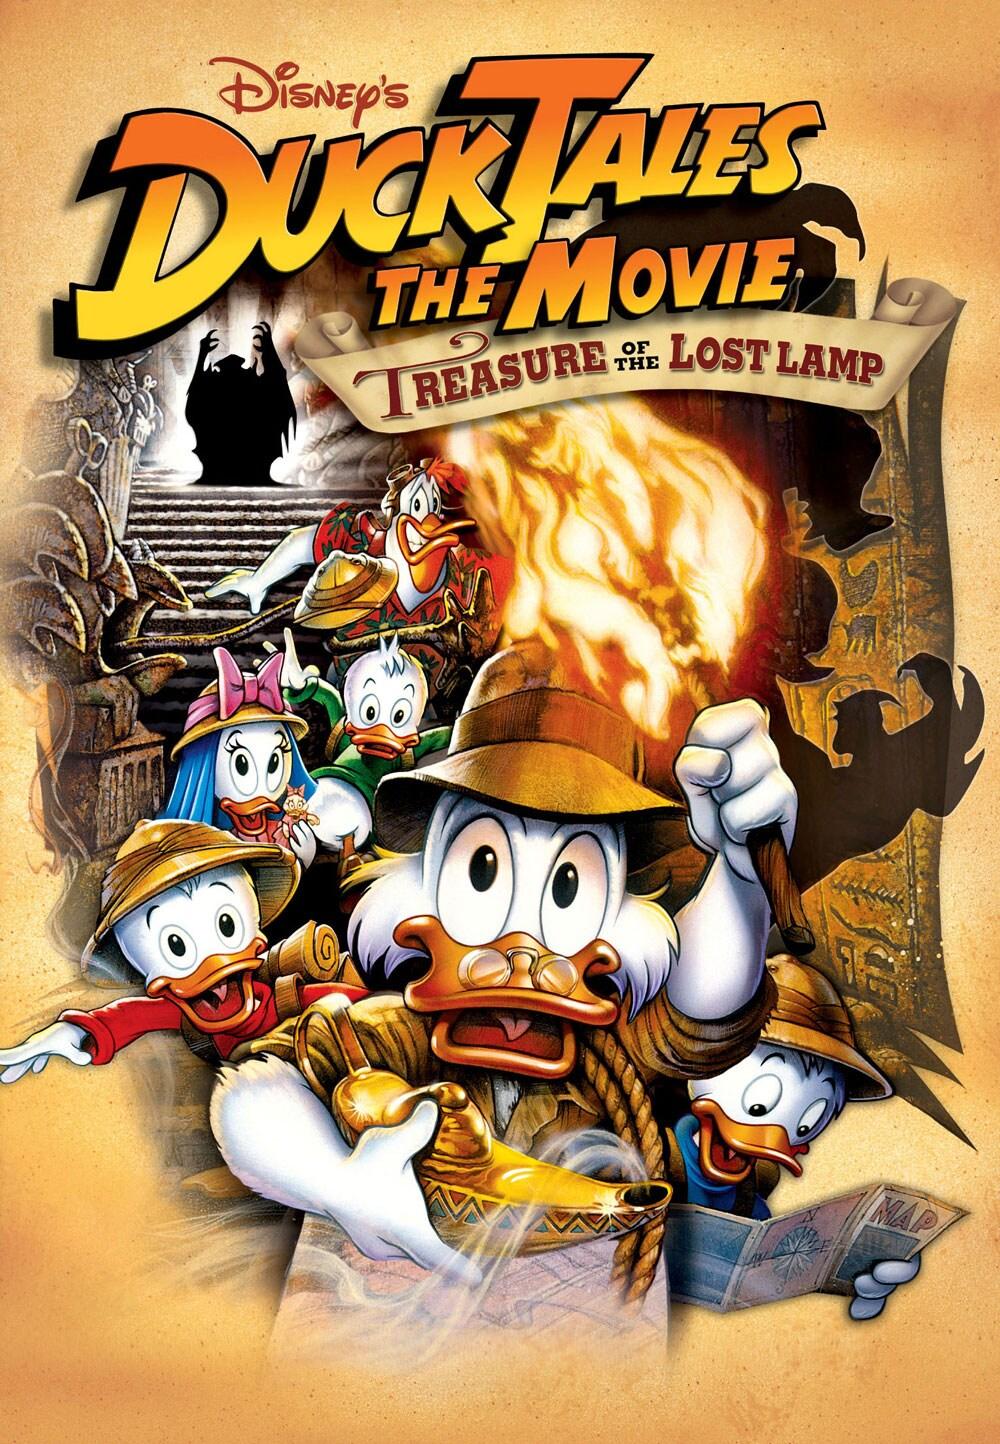 DuckTales: The Movie - Treasure of the Lost Lamp | Disney Movies